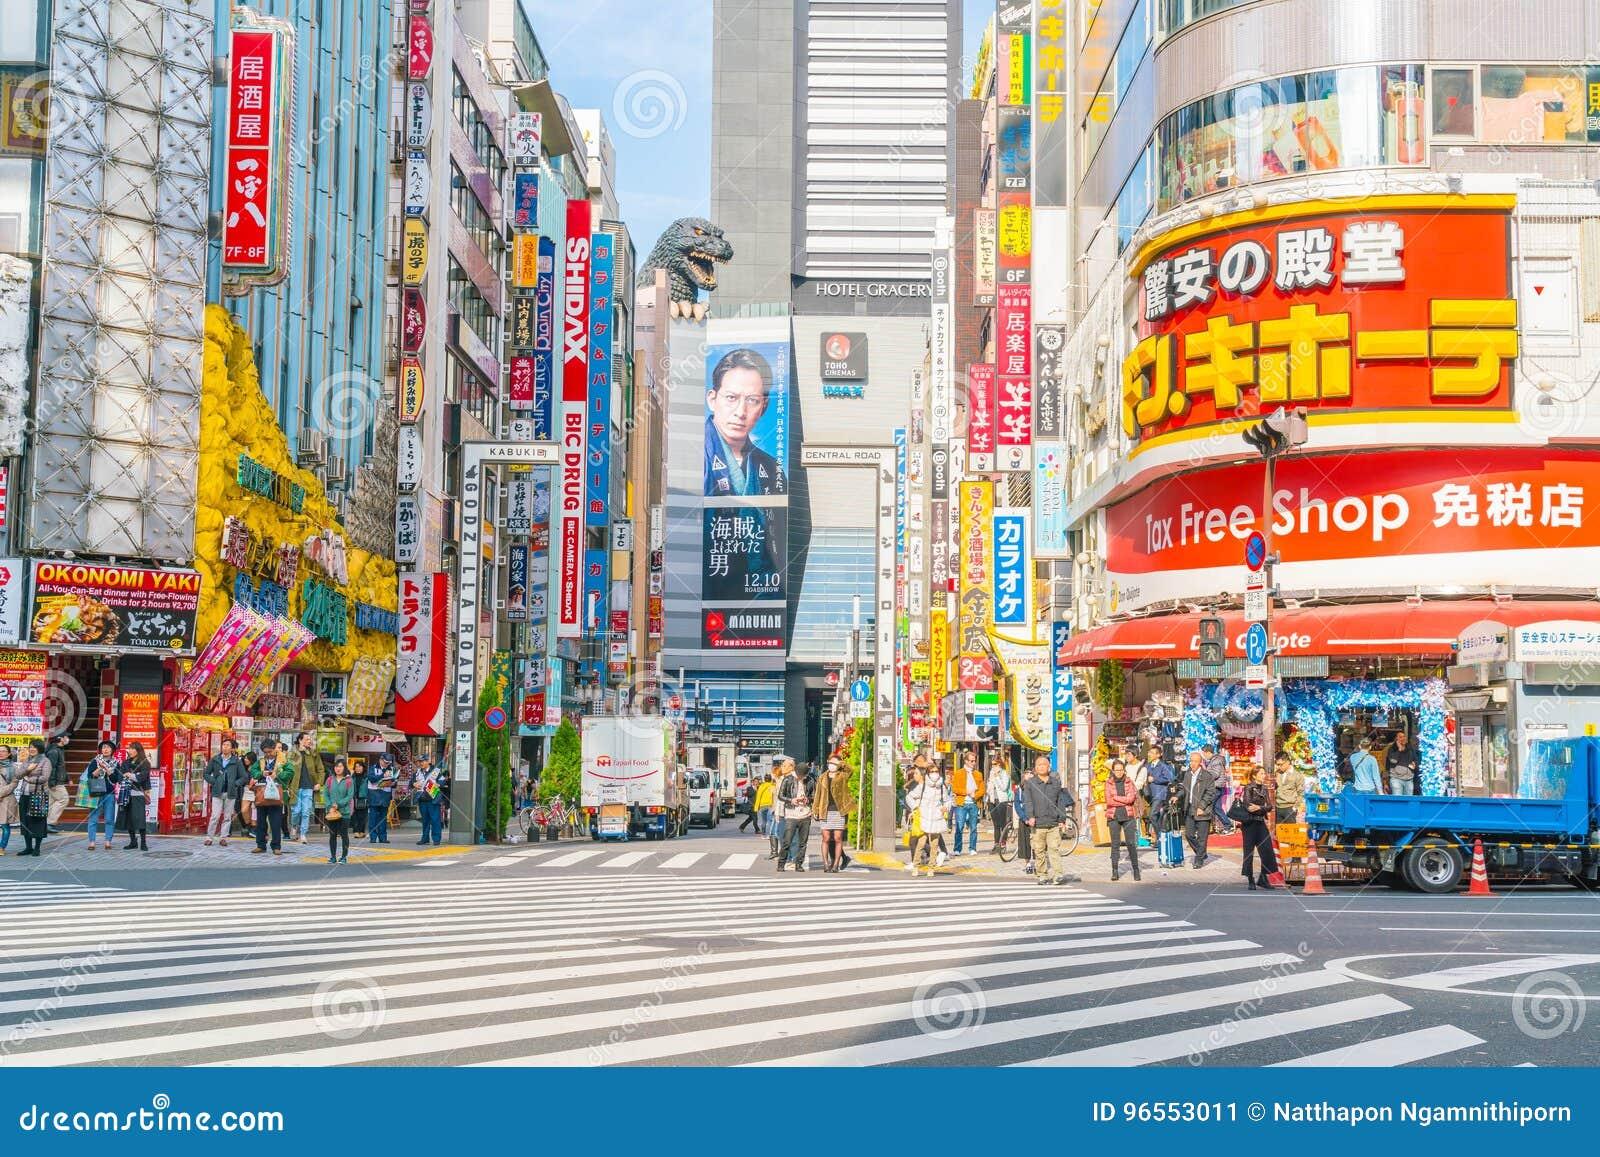 TOKYO ,JAPAN - 2016 Nov 17 : Shinjuku is one of Tokyo s busine